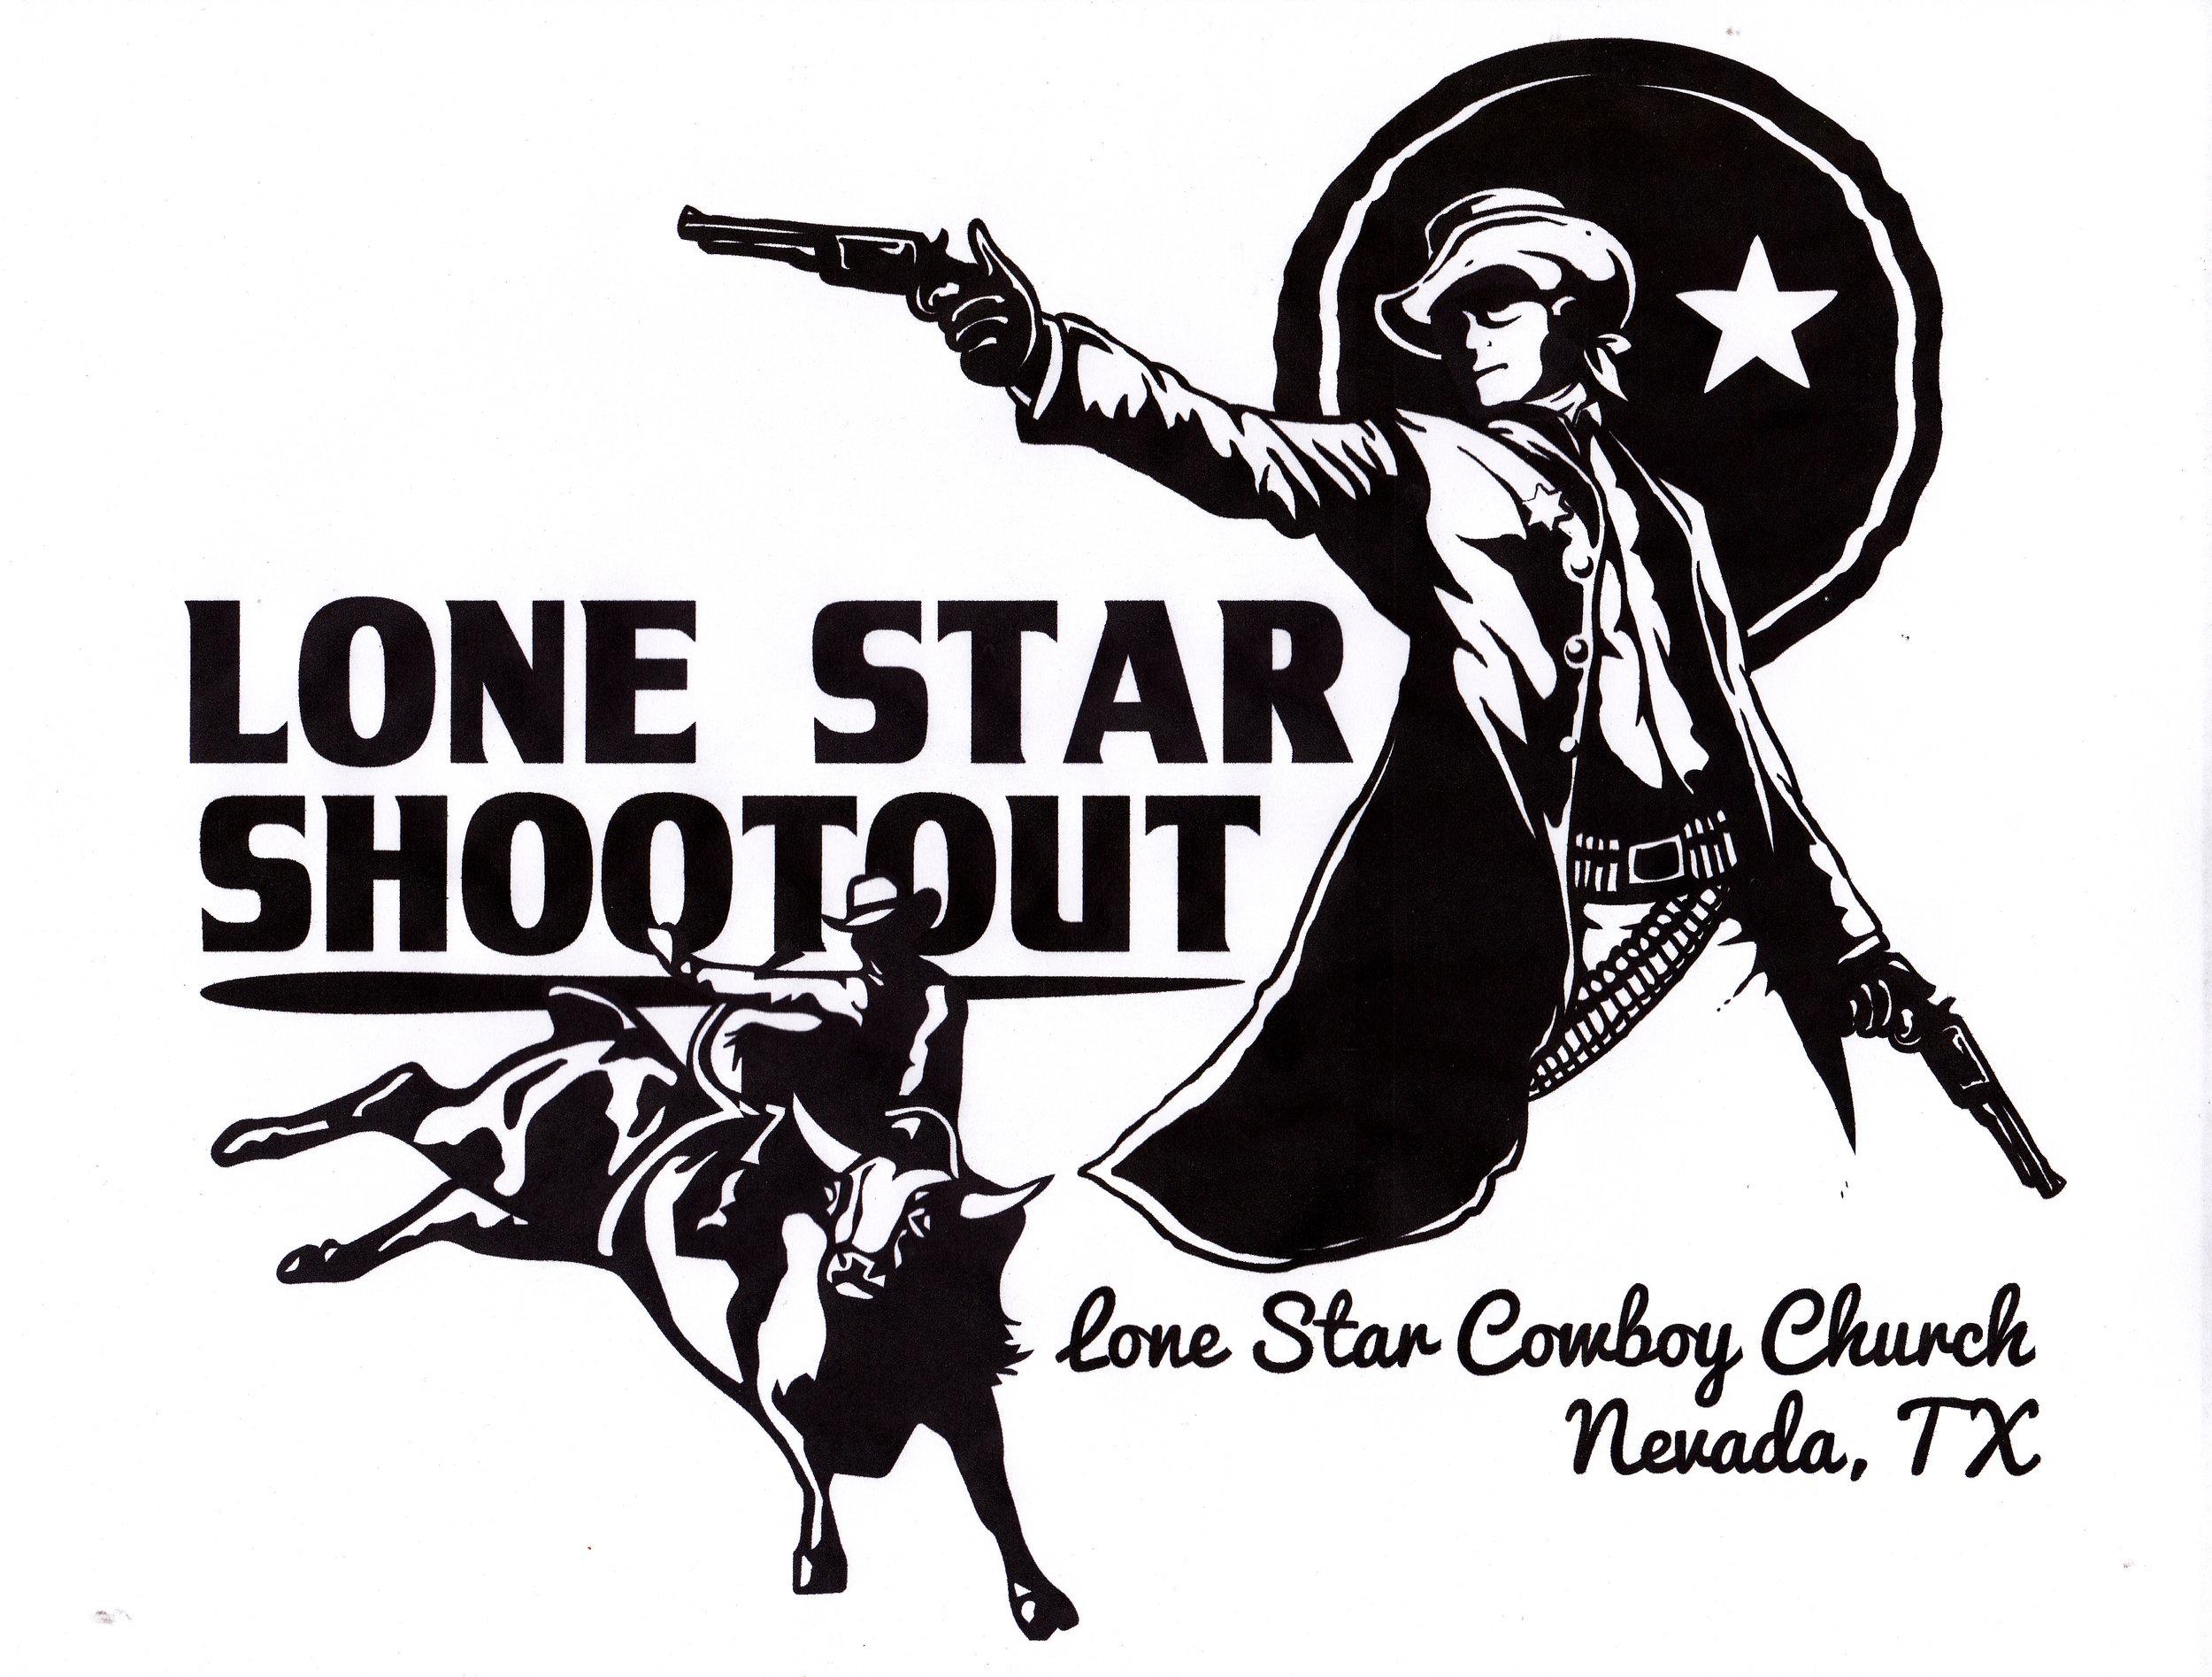 Lone star shootout.jpg